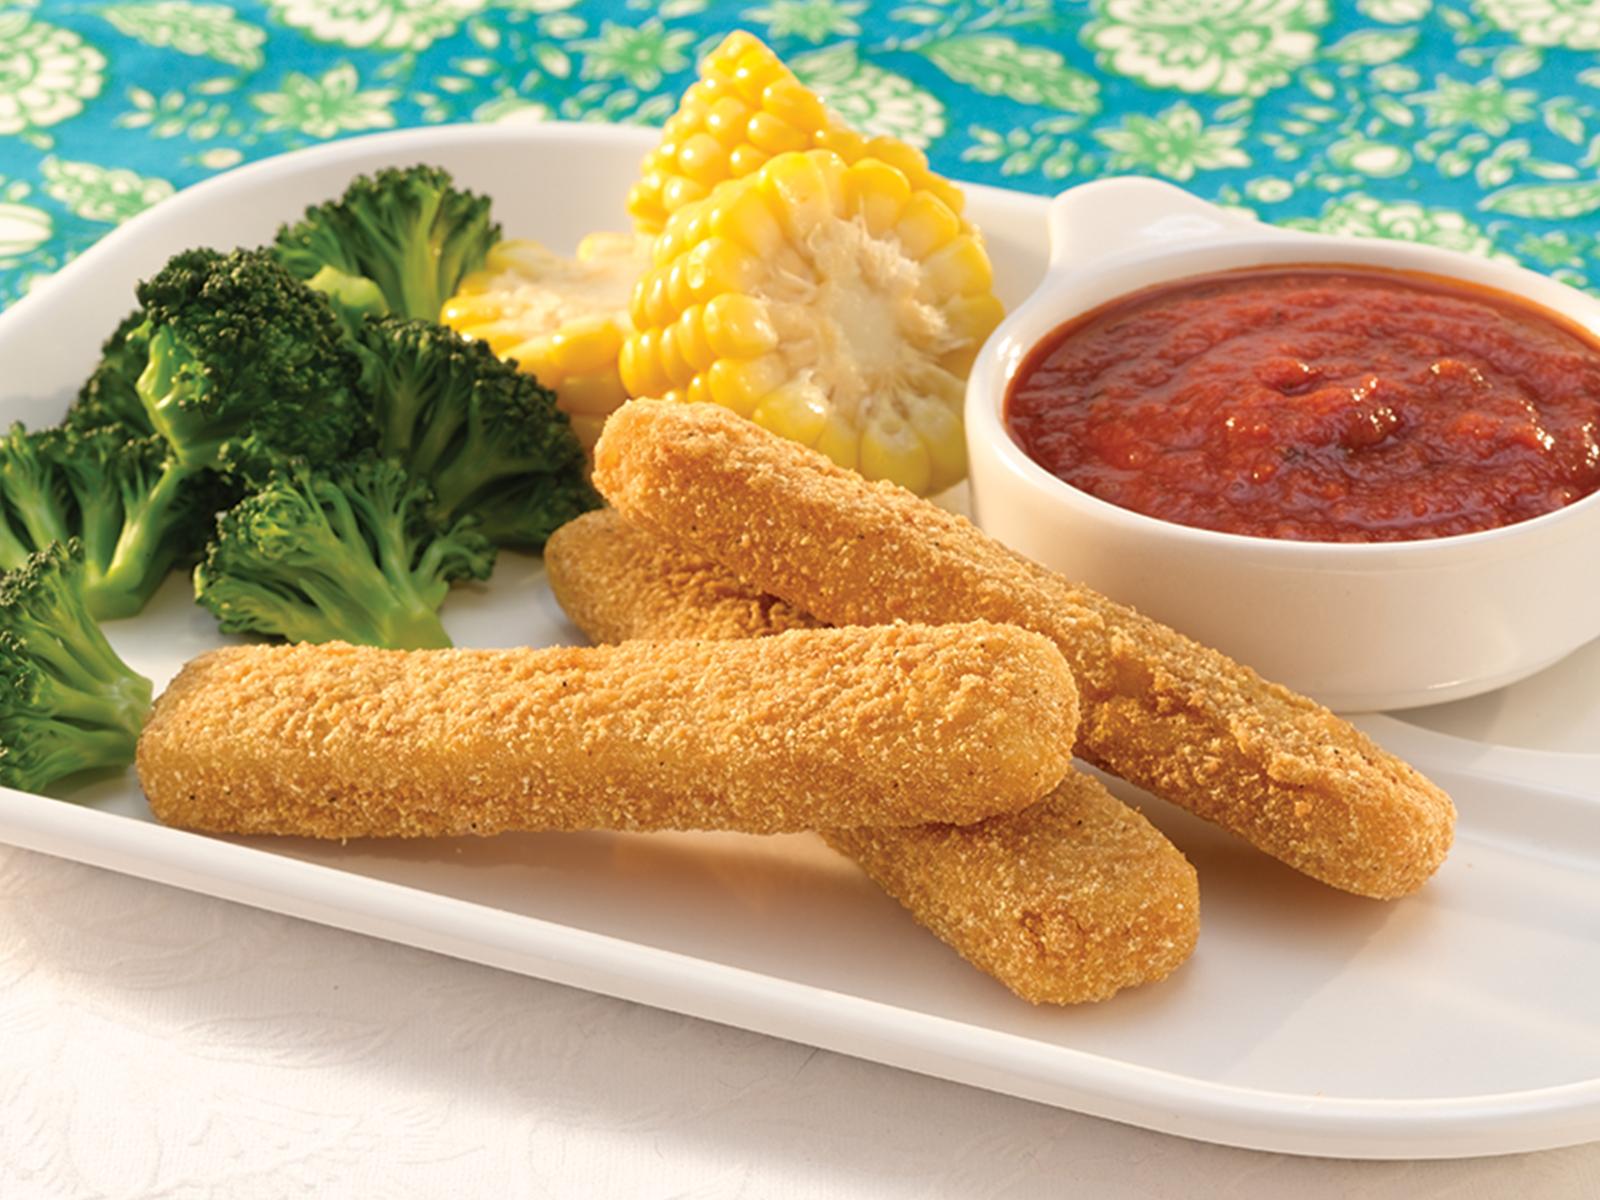 Crunchy Cornmeal Wild Alaska Pollock Strips 1.5 oz WG, CN, Oven Ready 418303